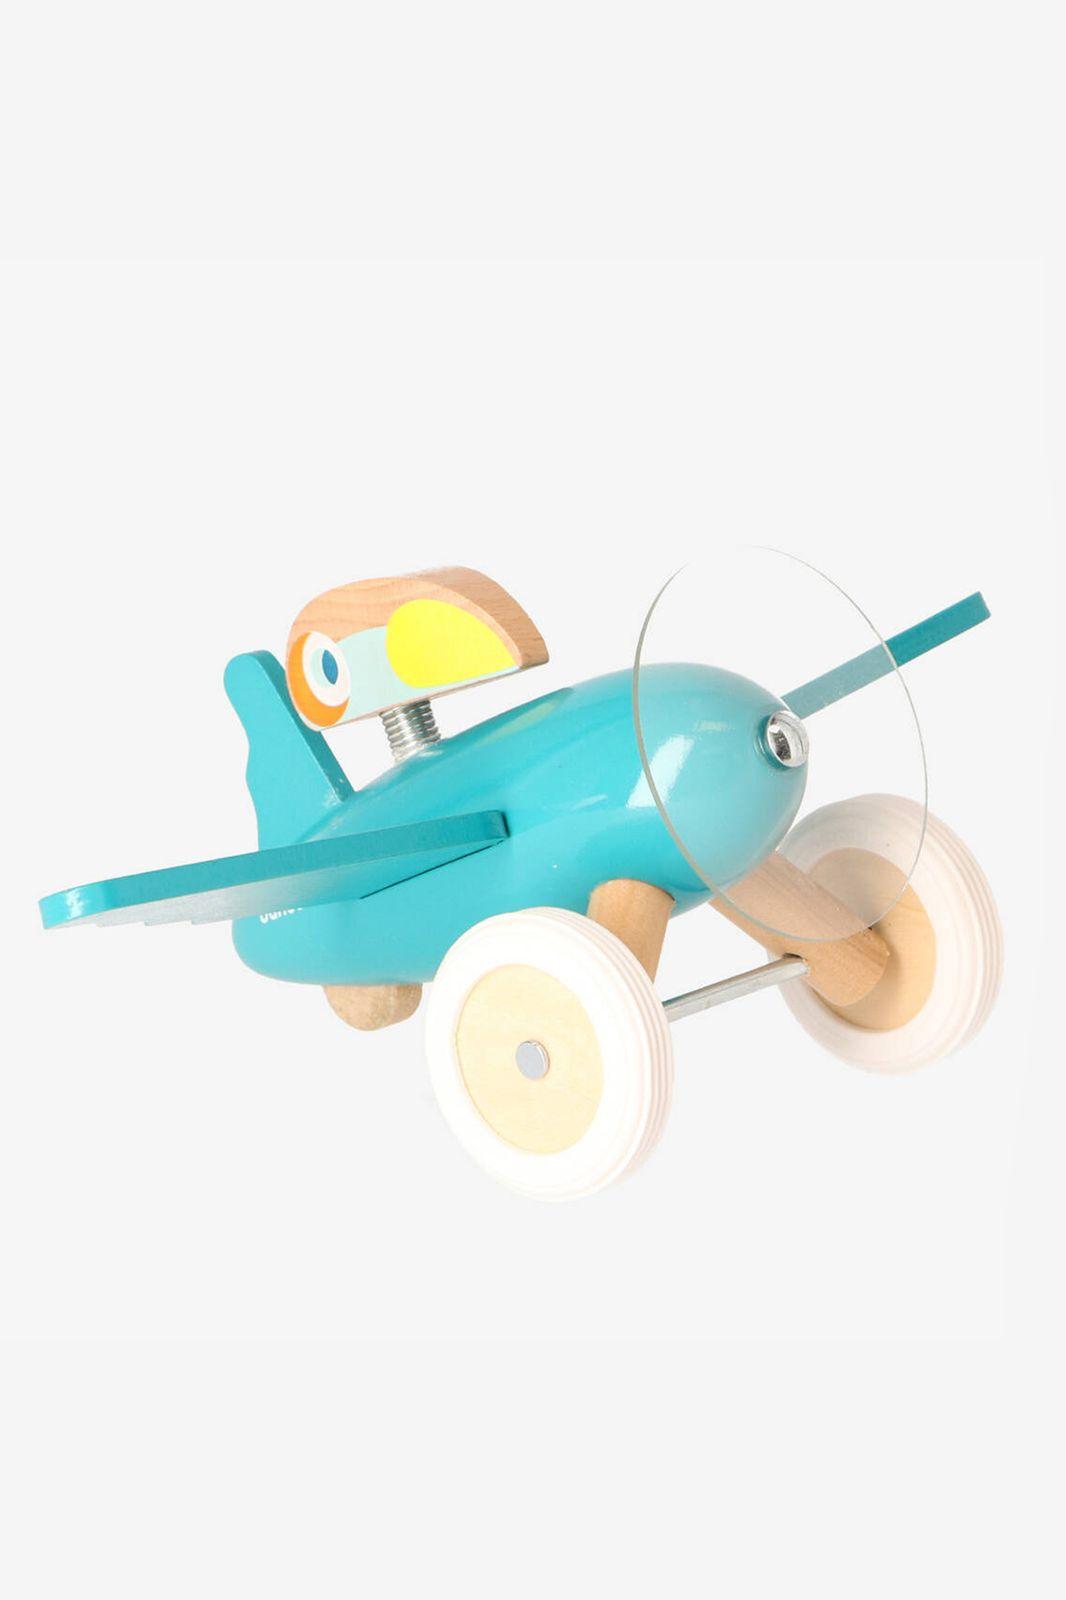 Houten speelvliegtuig - Homeland   Sissy-Boy